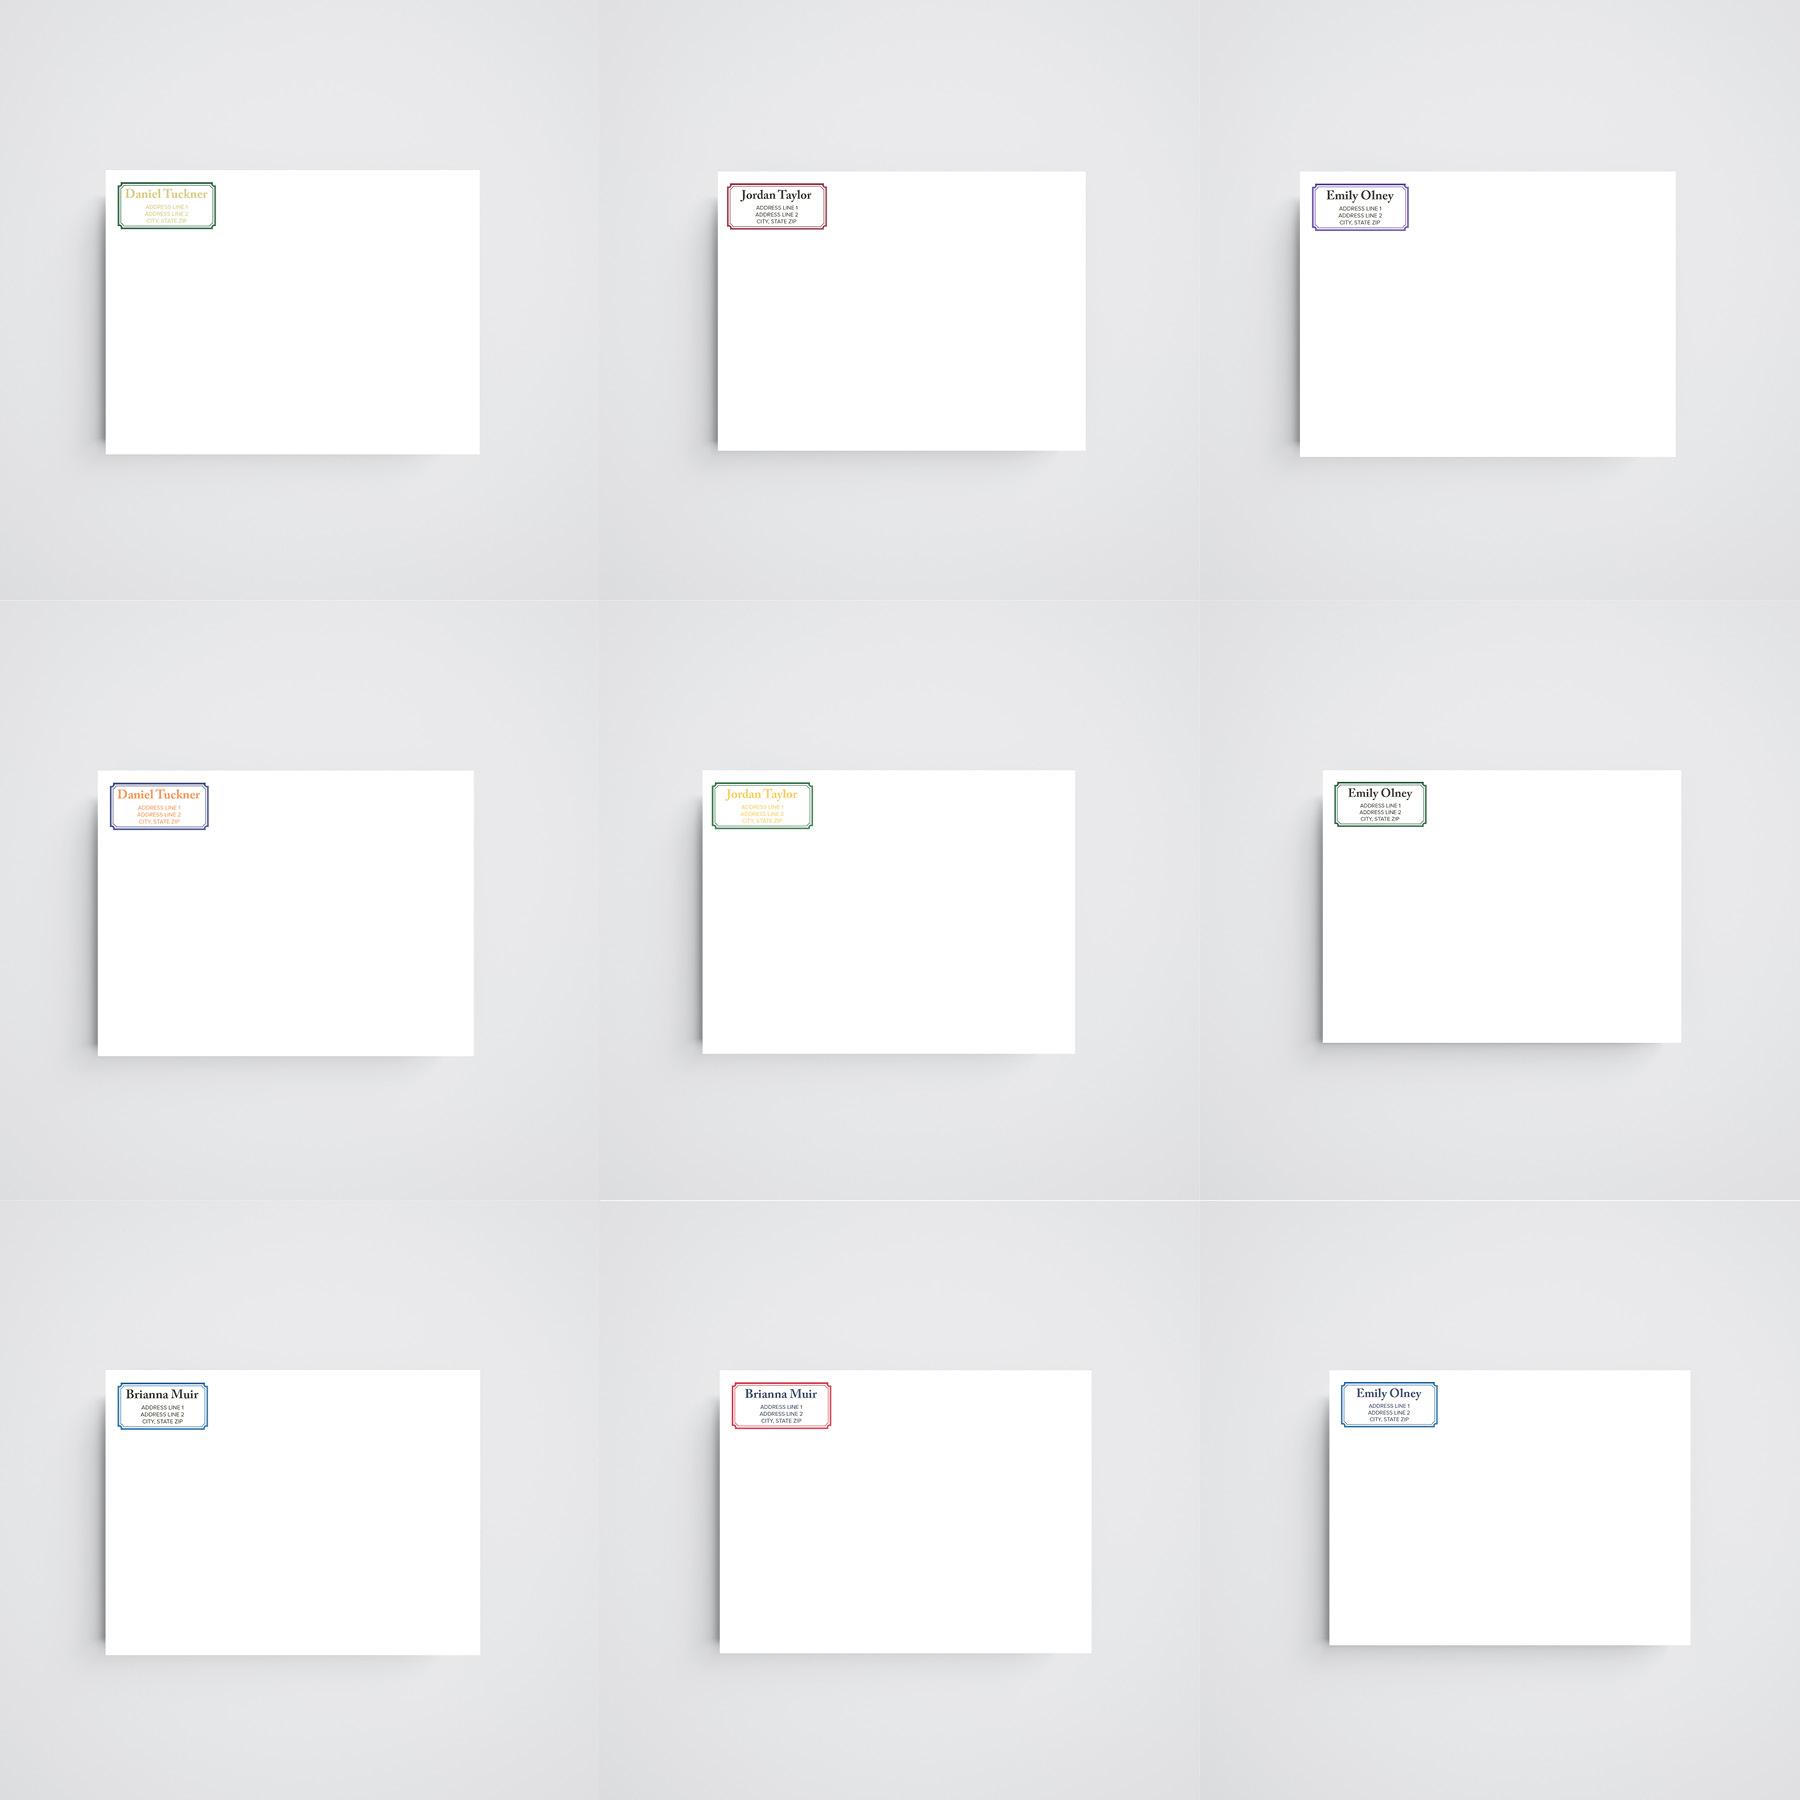 Personalized Thank You Envelopes